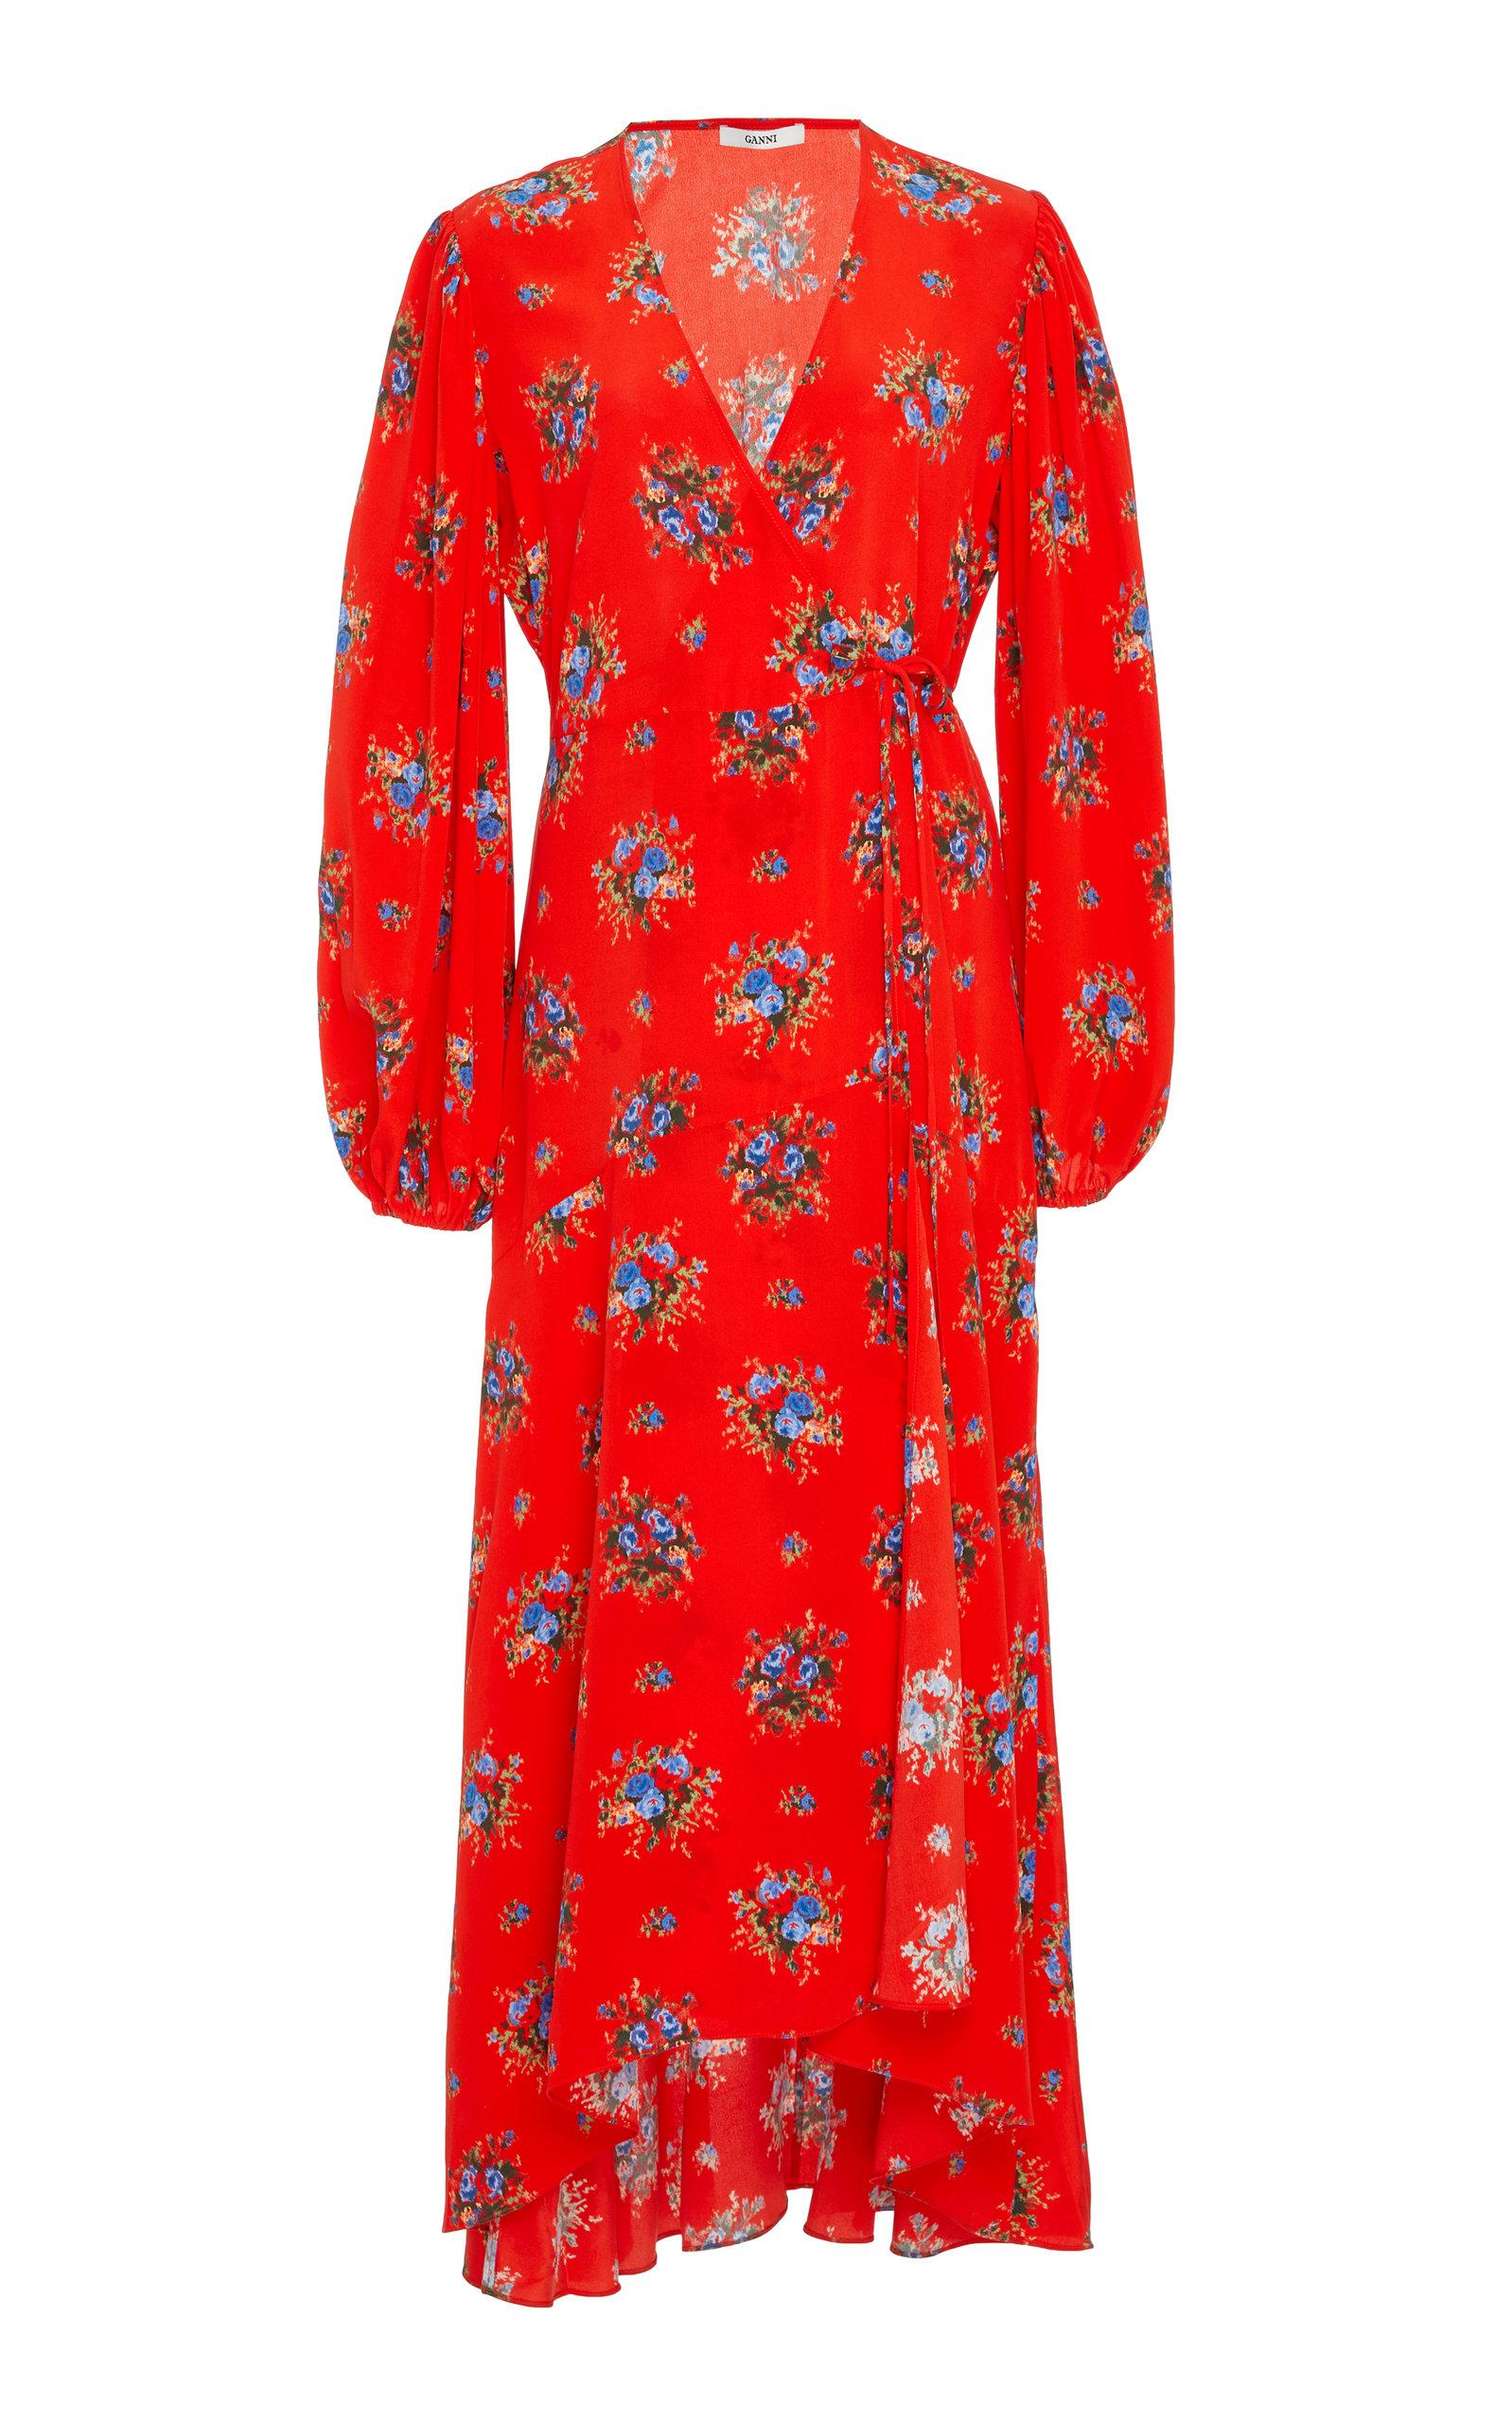 15647ad0 GanniKochhar Floral-Print Silk Crepe De Chine Wrap Dress. CLOSE. Loading